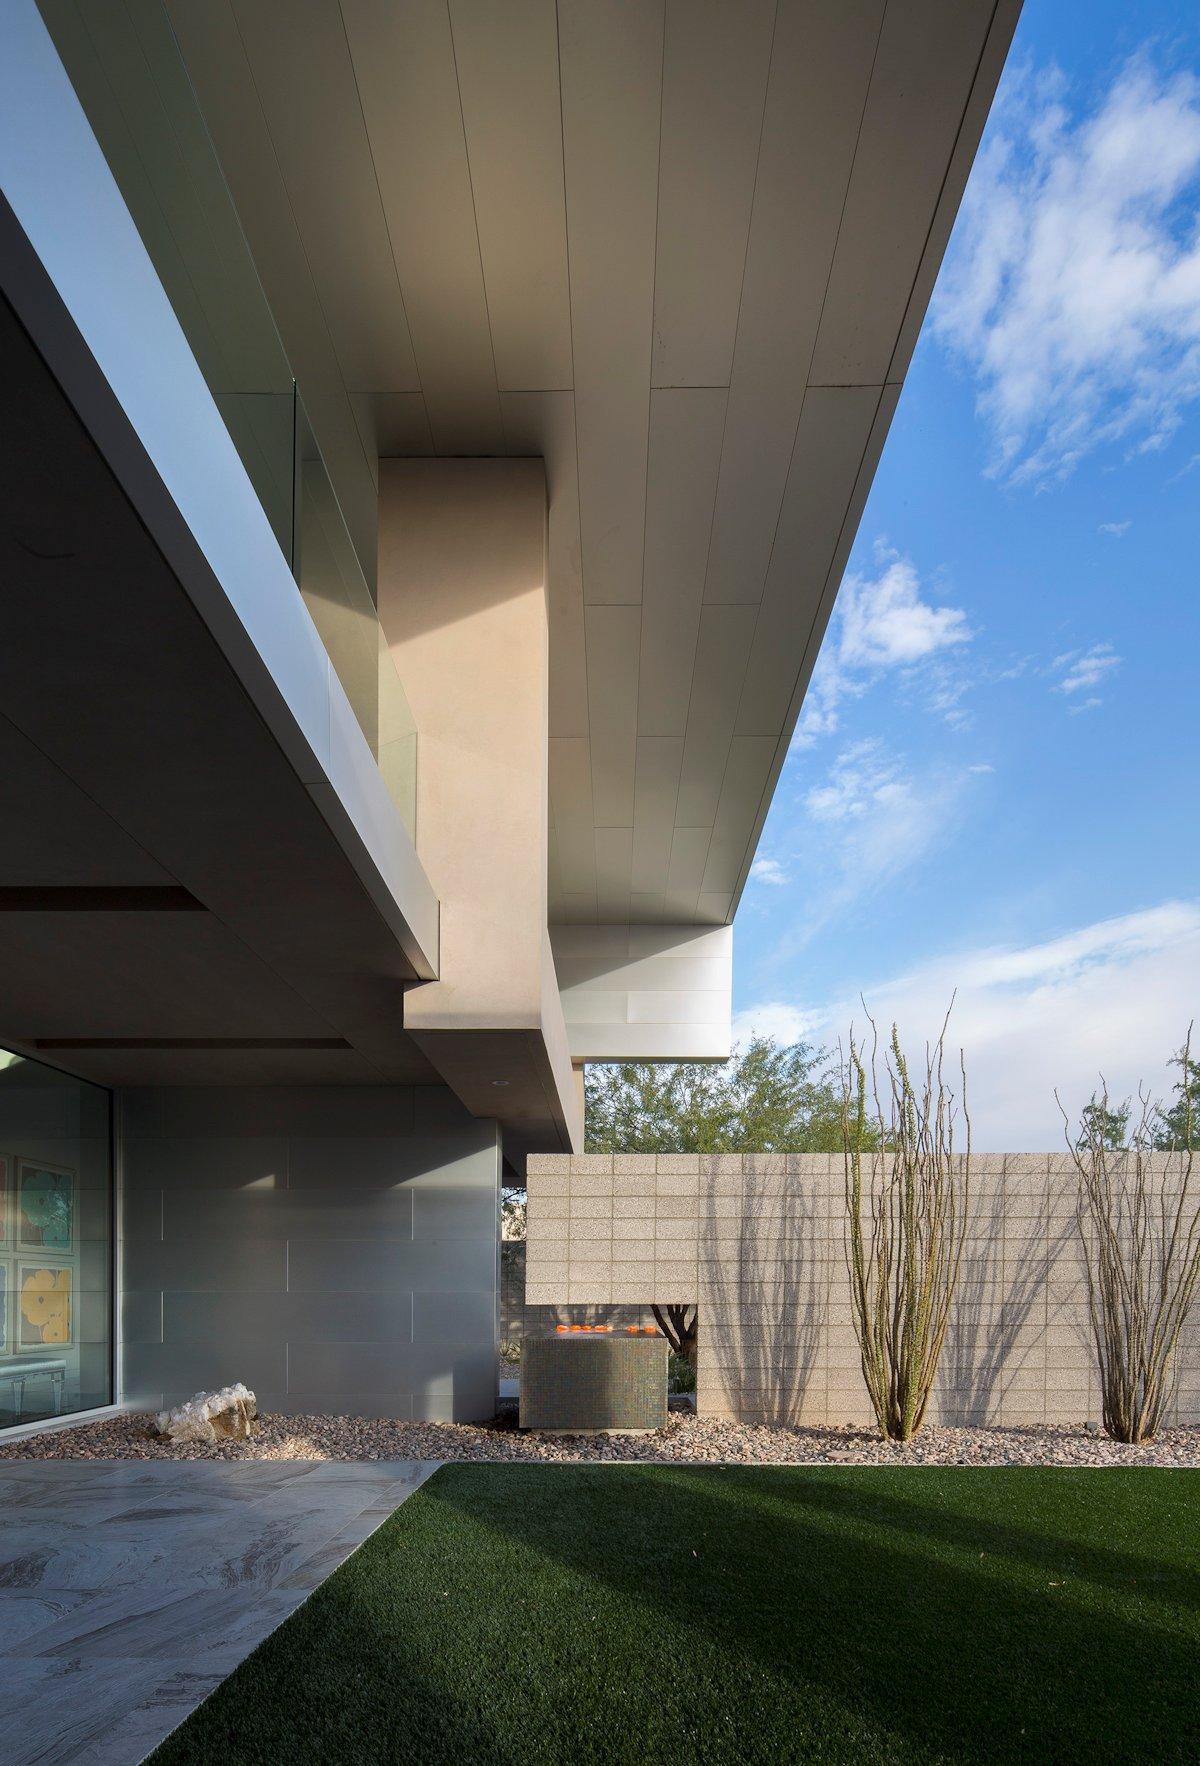 Water & Fire Feature, Mid-Century Modern Home in Scottsdale, Arizona